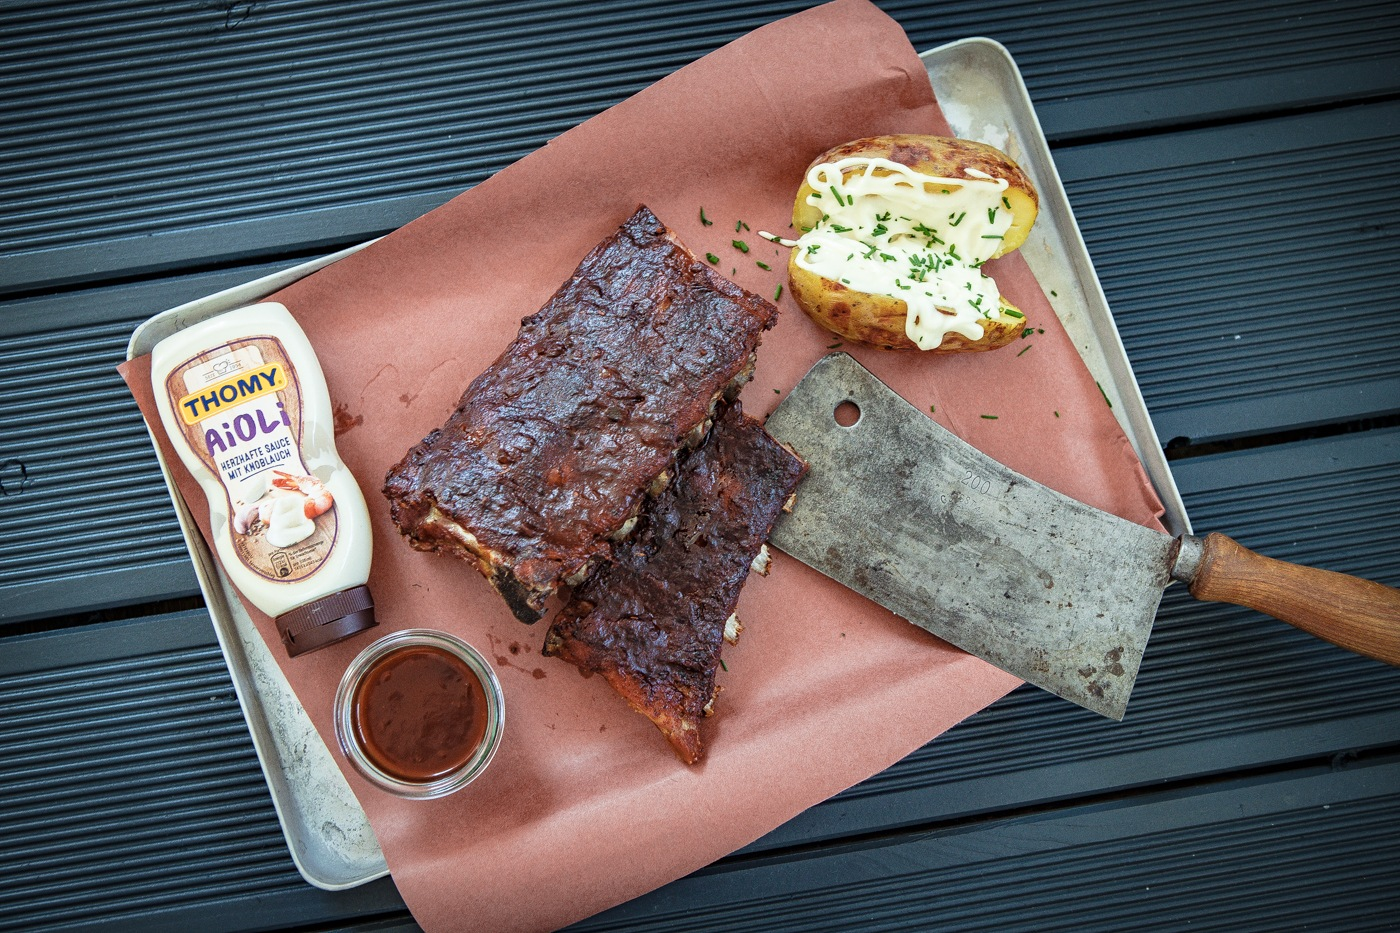 BBQlicate | Grill- & BBQ-Blog on Feedspot - Rss Feed